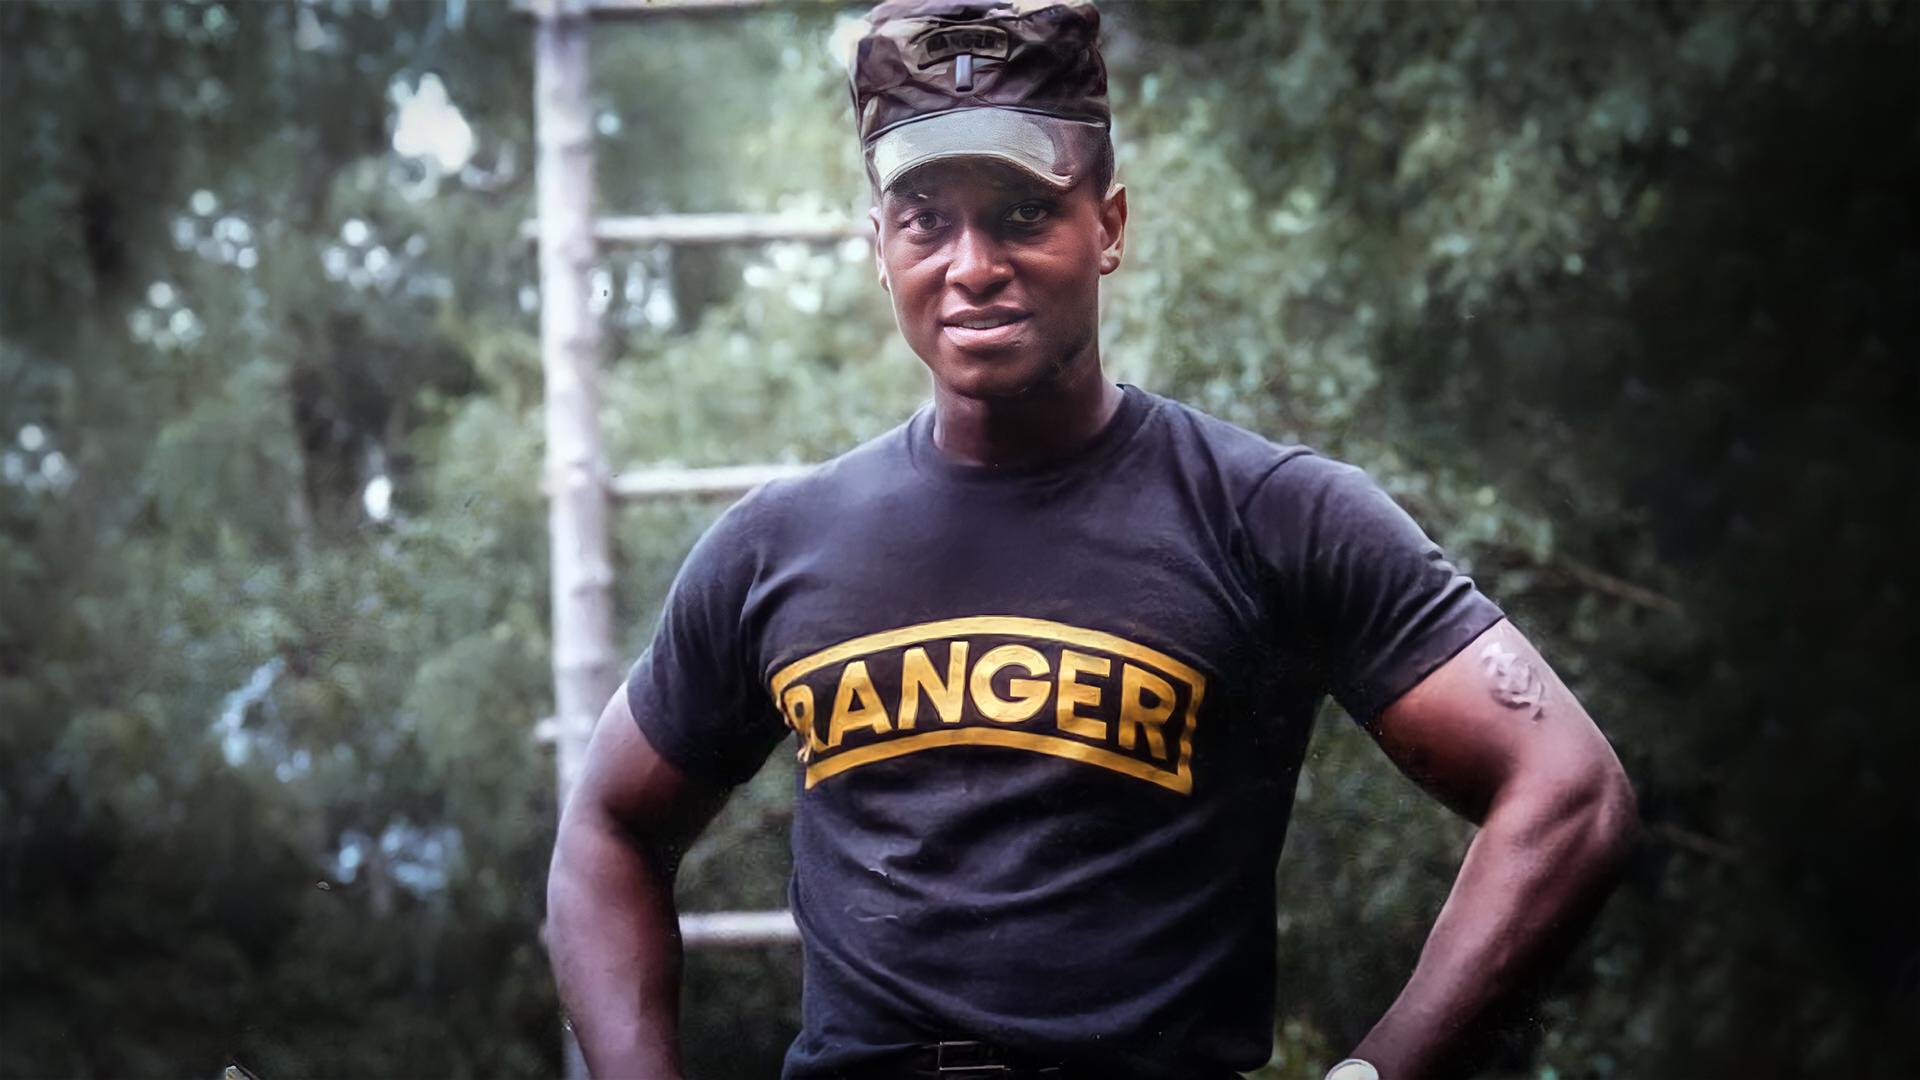 VP Roger Jones: A Reflection on Black History